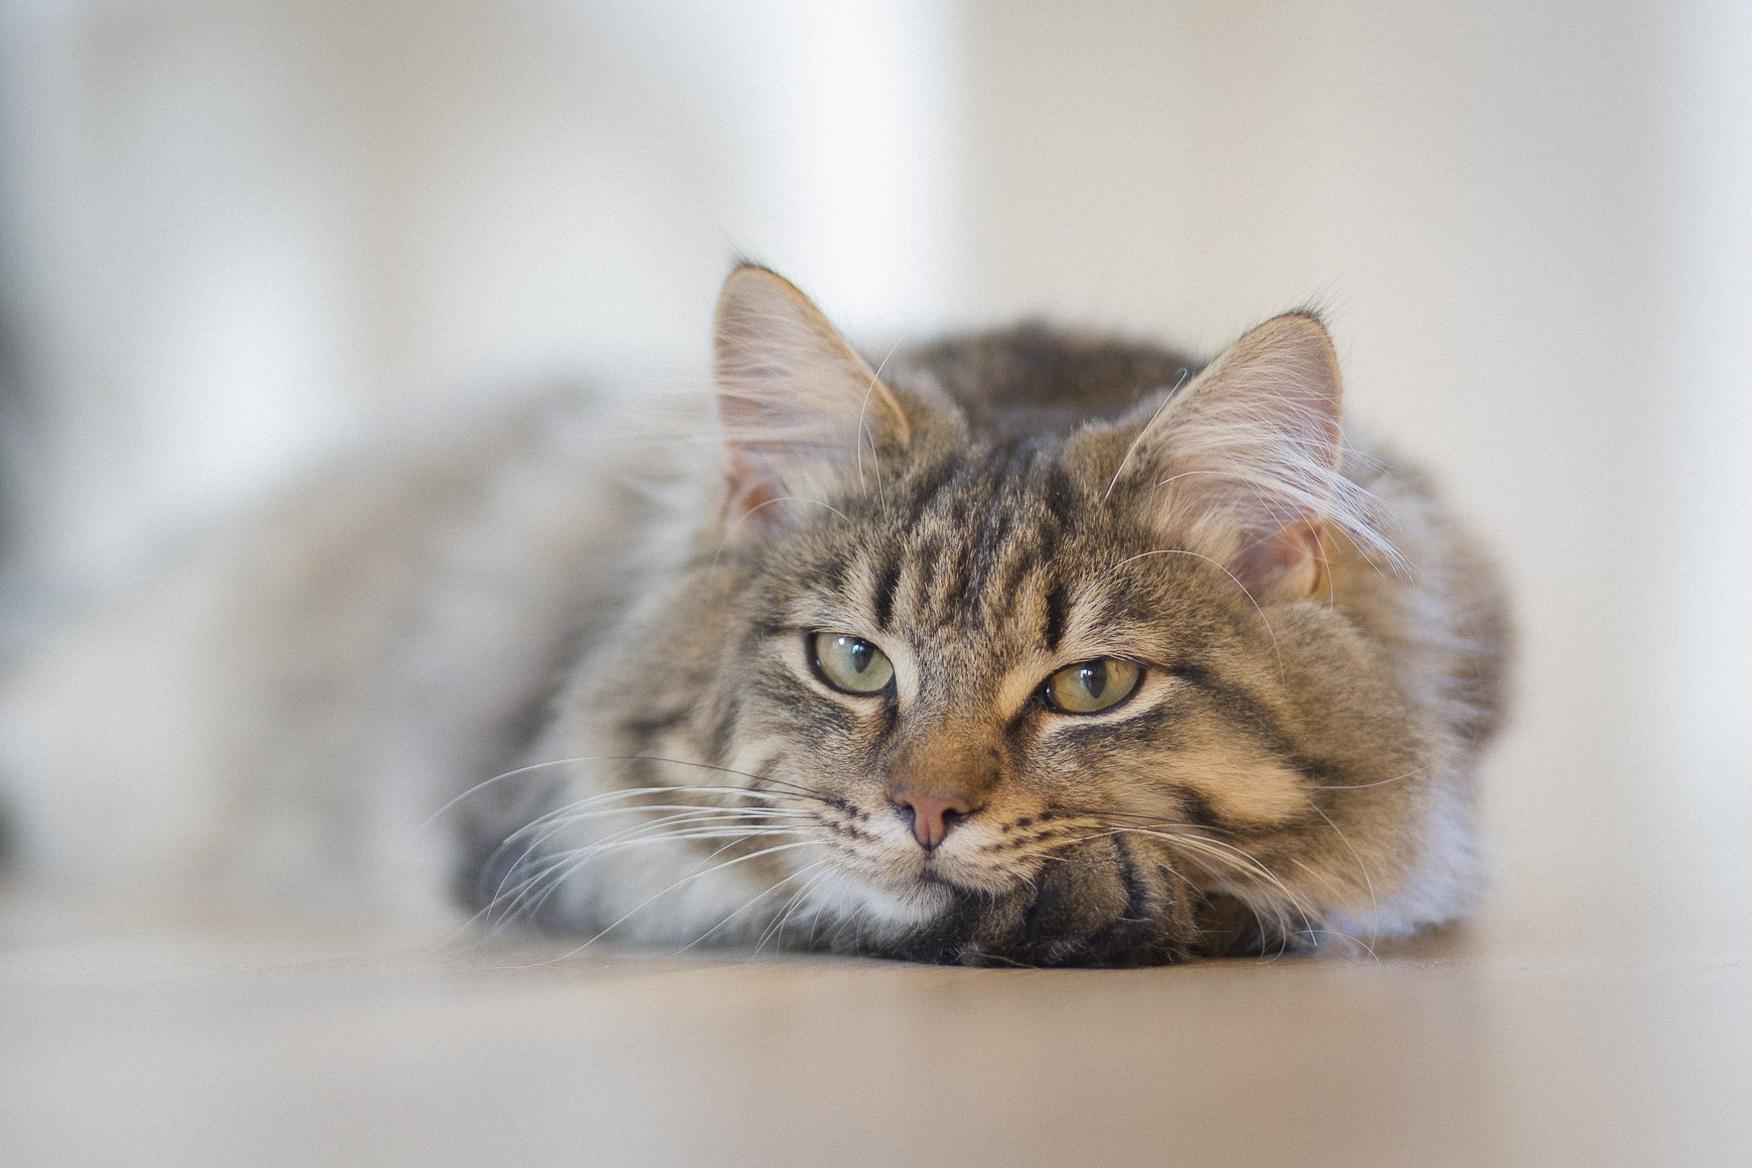 Download 67+  Gambar Kucing Ngantuk Paling Baru HD